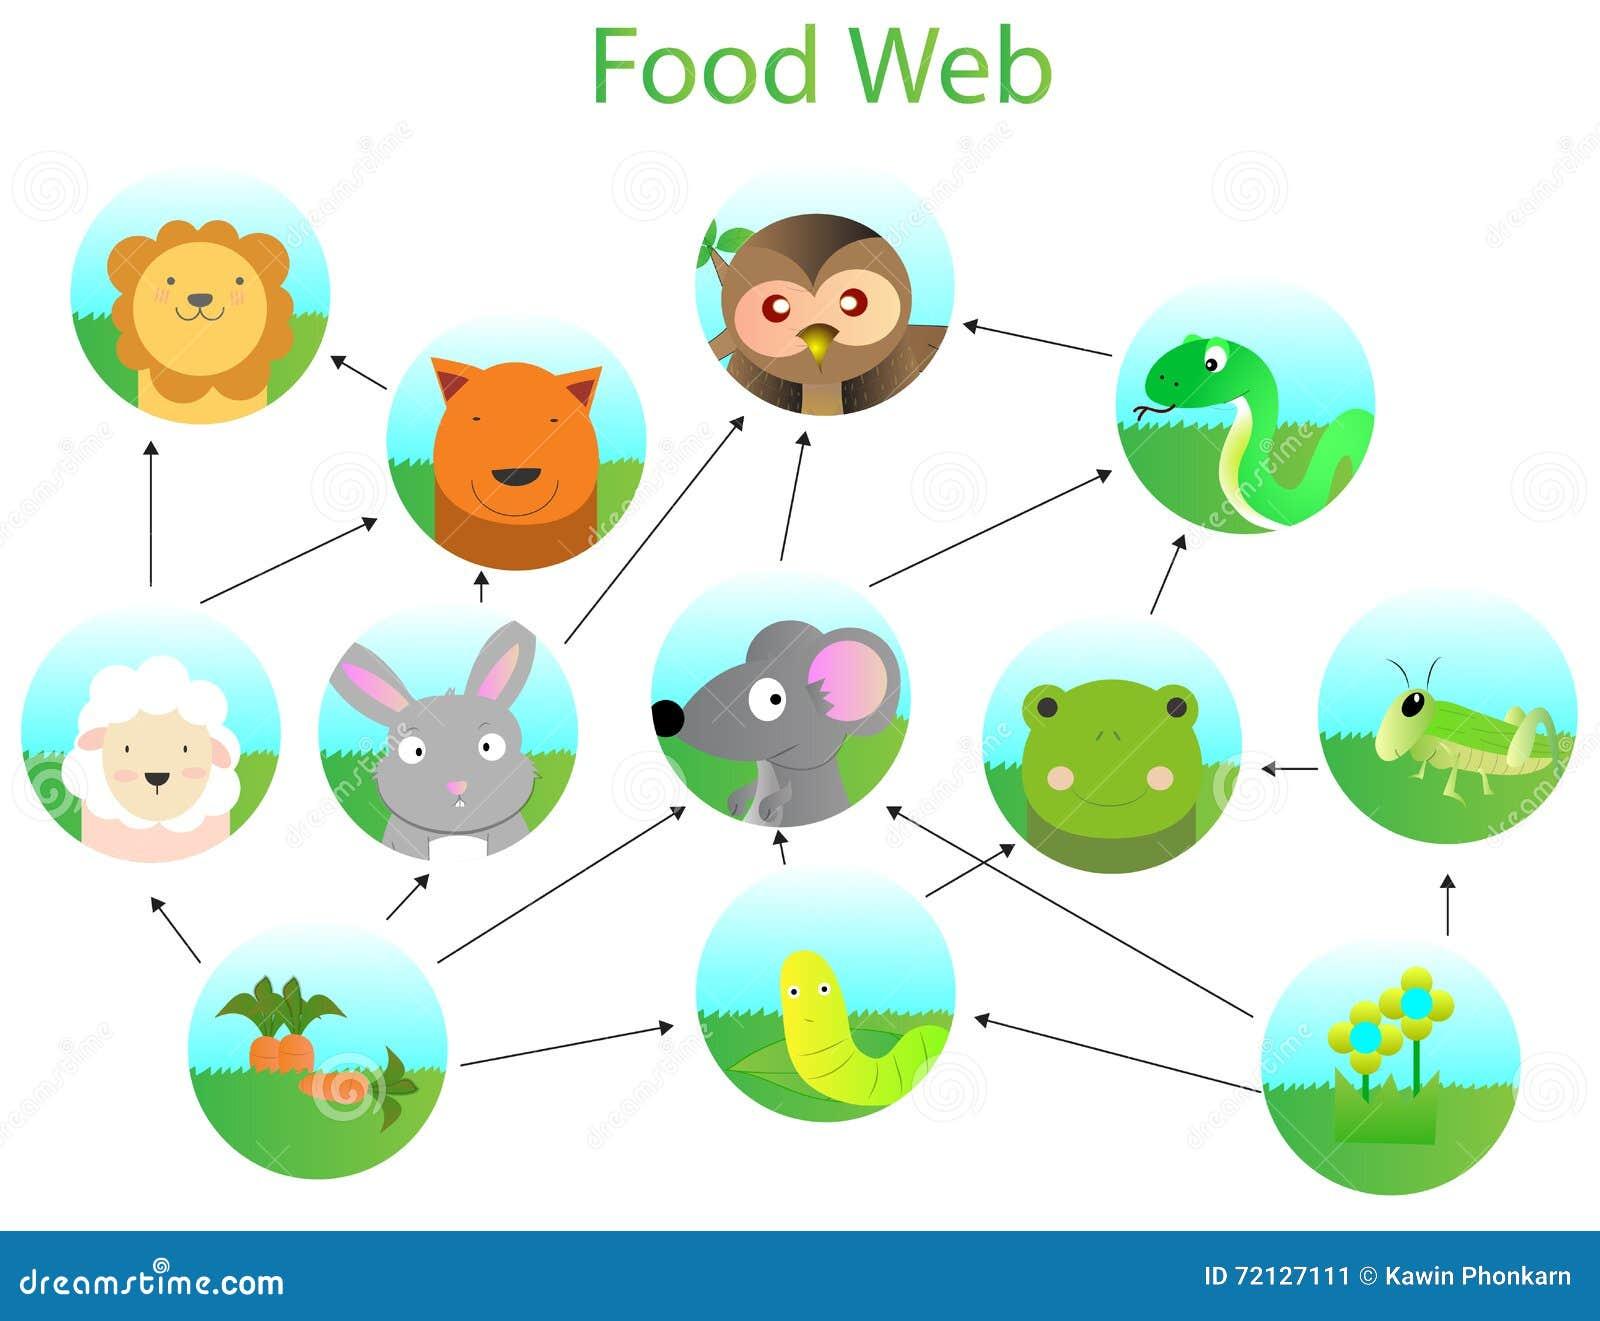 food web clipart � clipart download